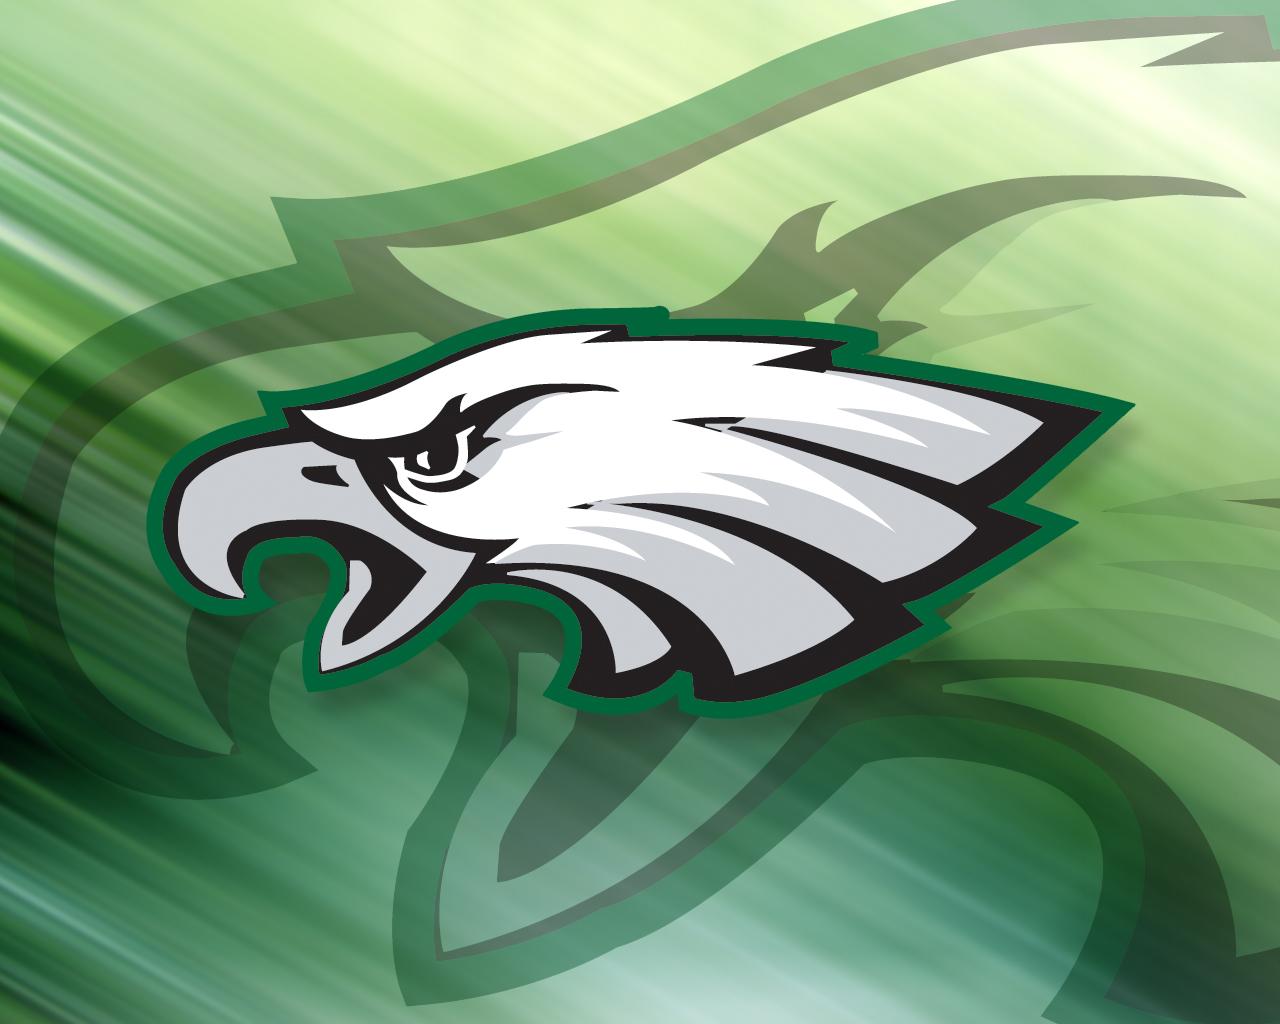 Philadelphia Eagles Wallpapers - Free Desktop Background Wallpapers